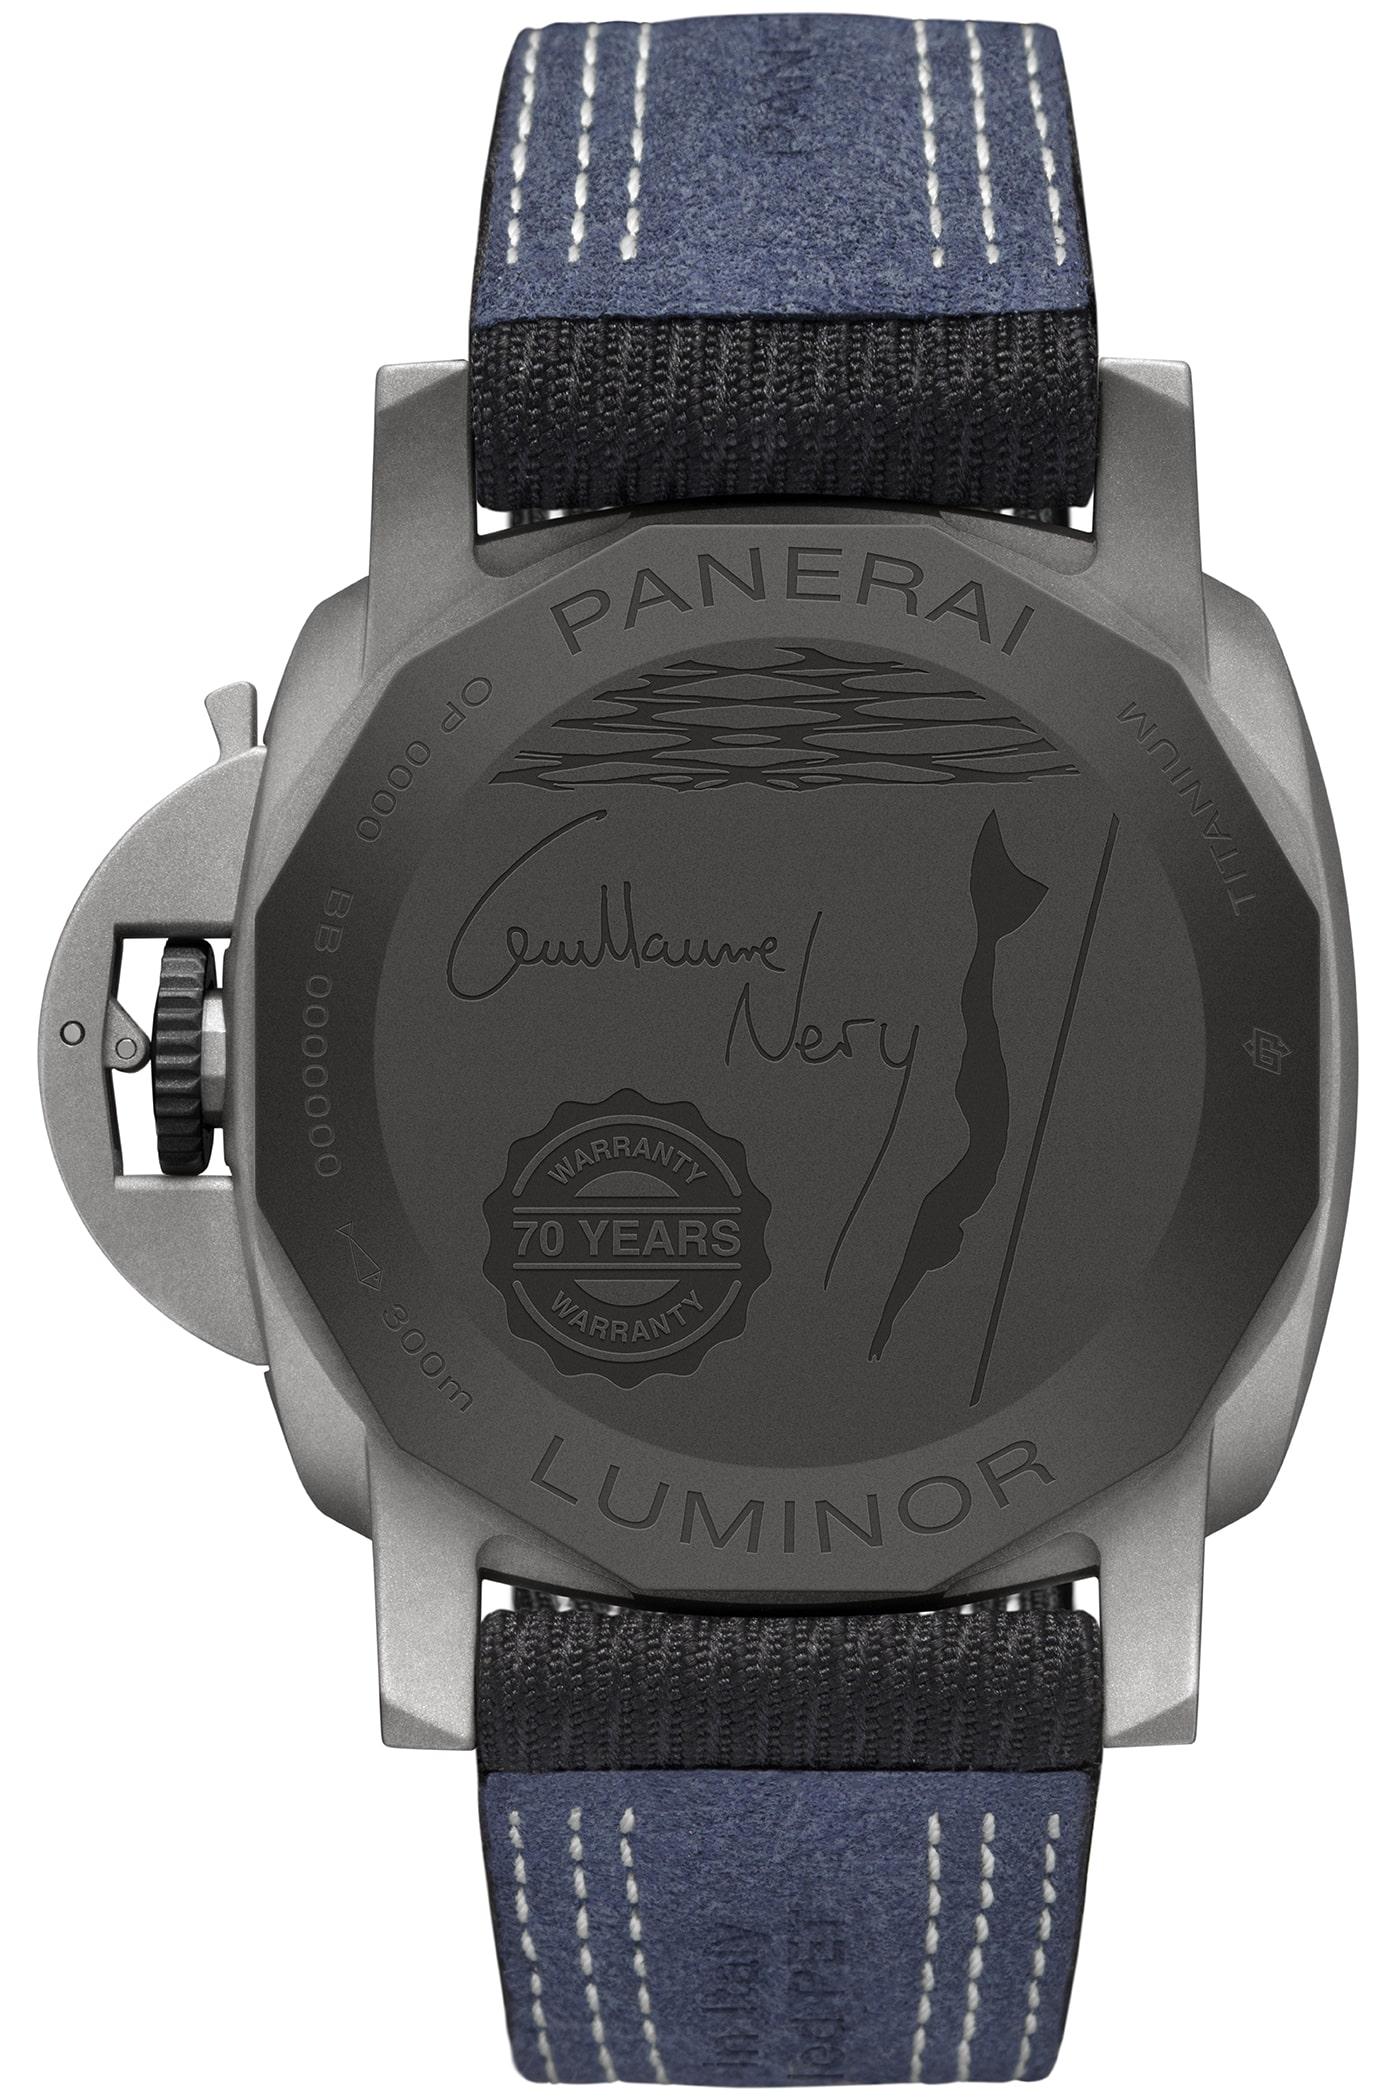 Panerai Luminor Marina 44mm Guillaume Nery Edition 3 min